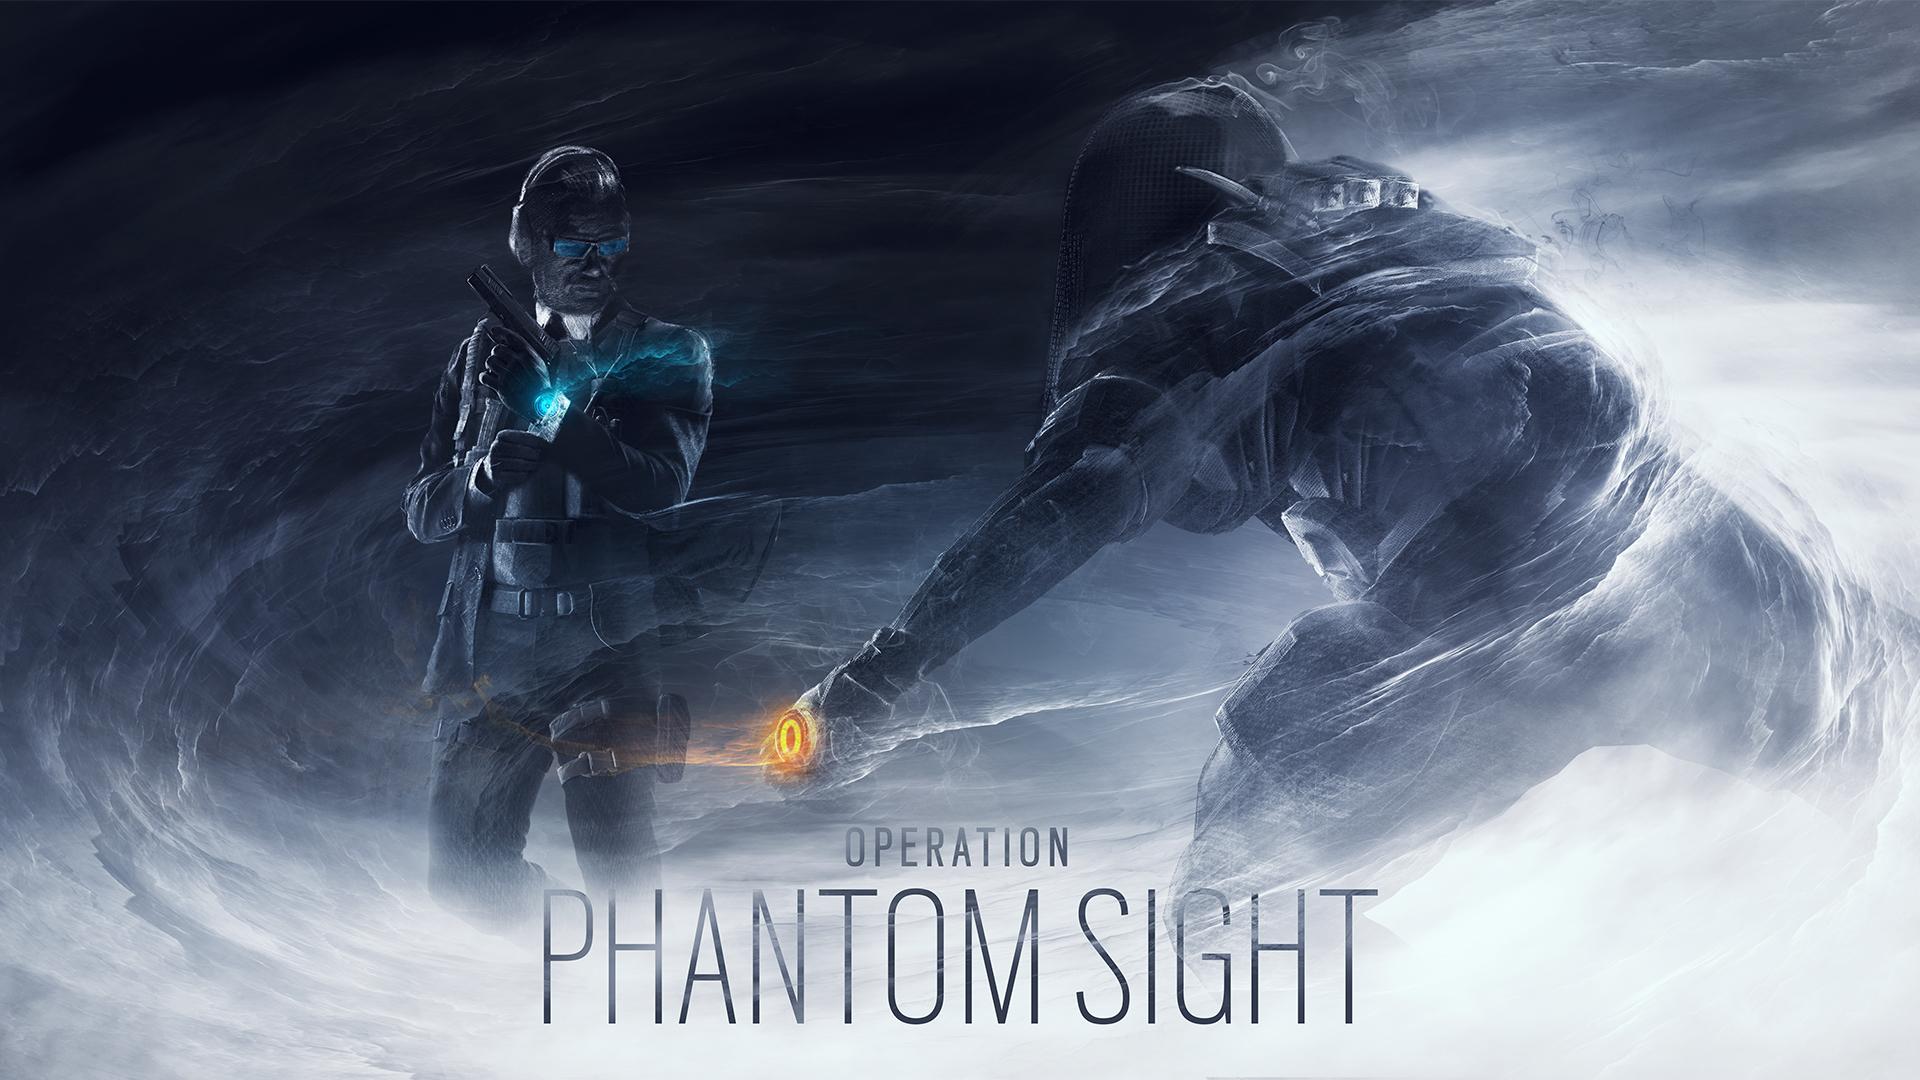 Siege S Operation Phantom Sight Operators Have Full Reveal